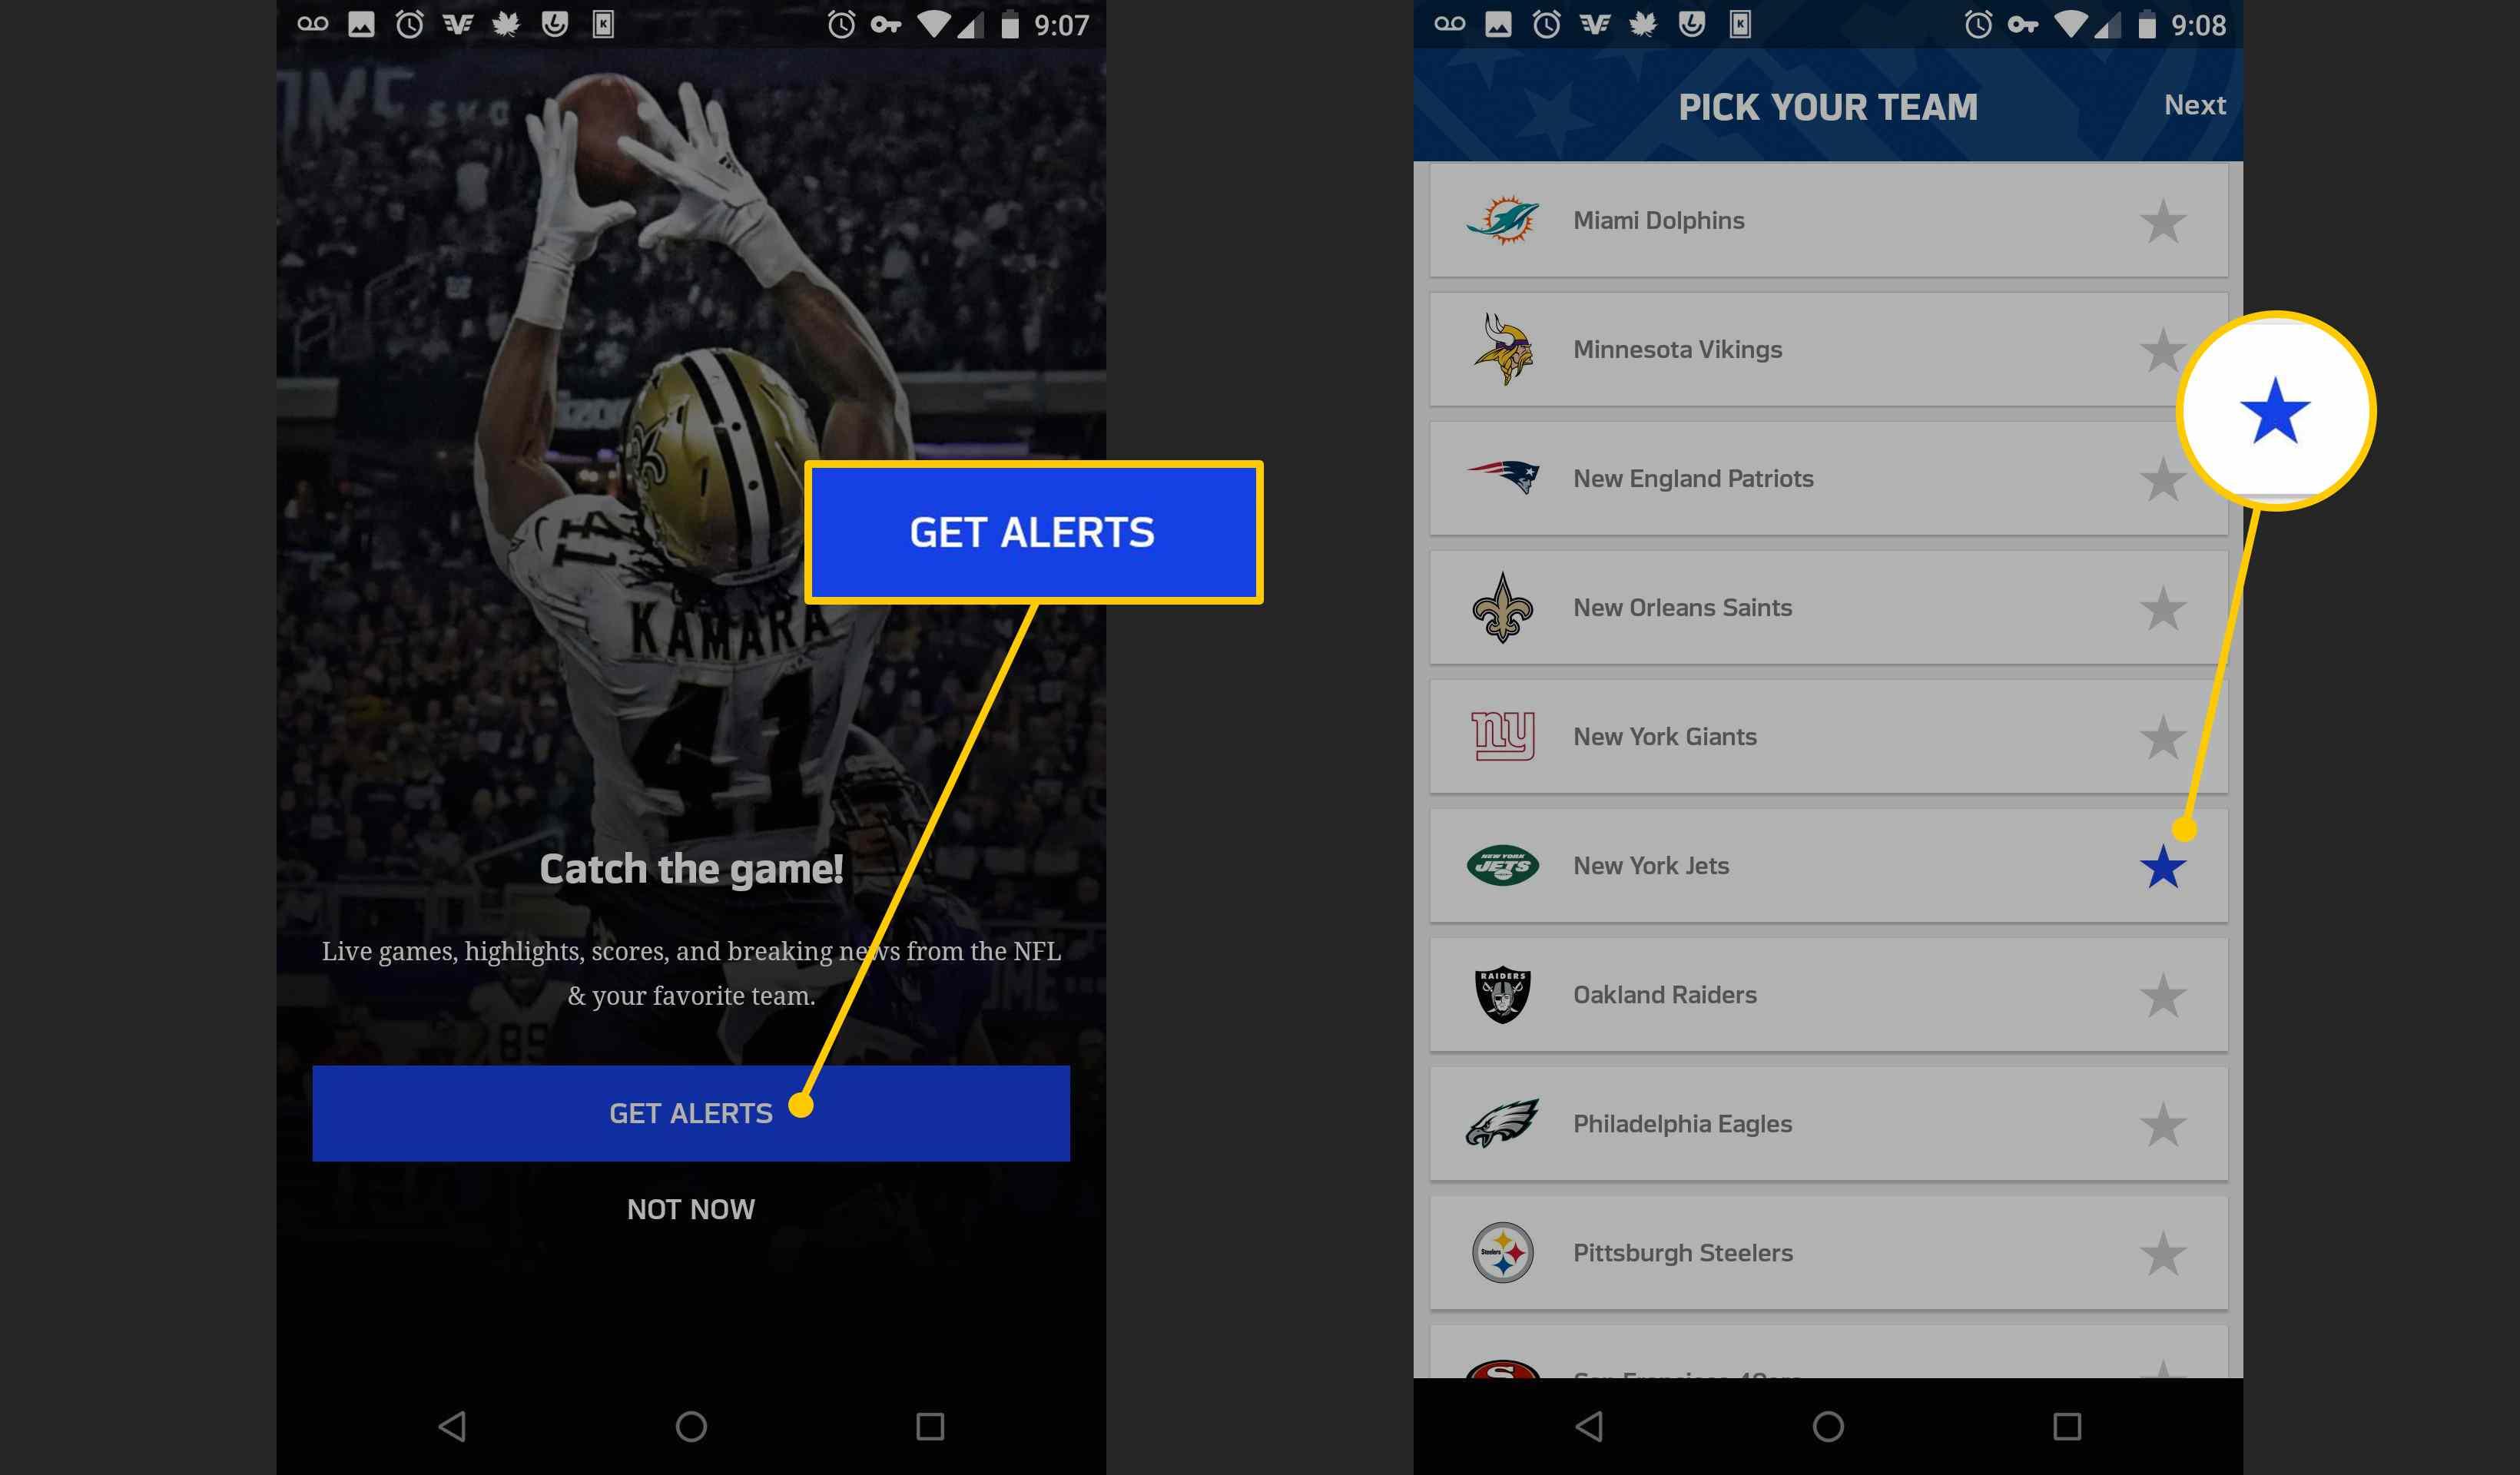 Get Alerts button in NFL app